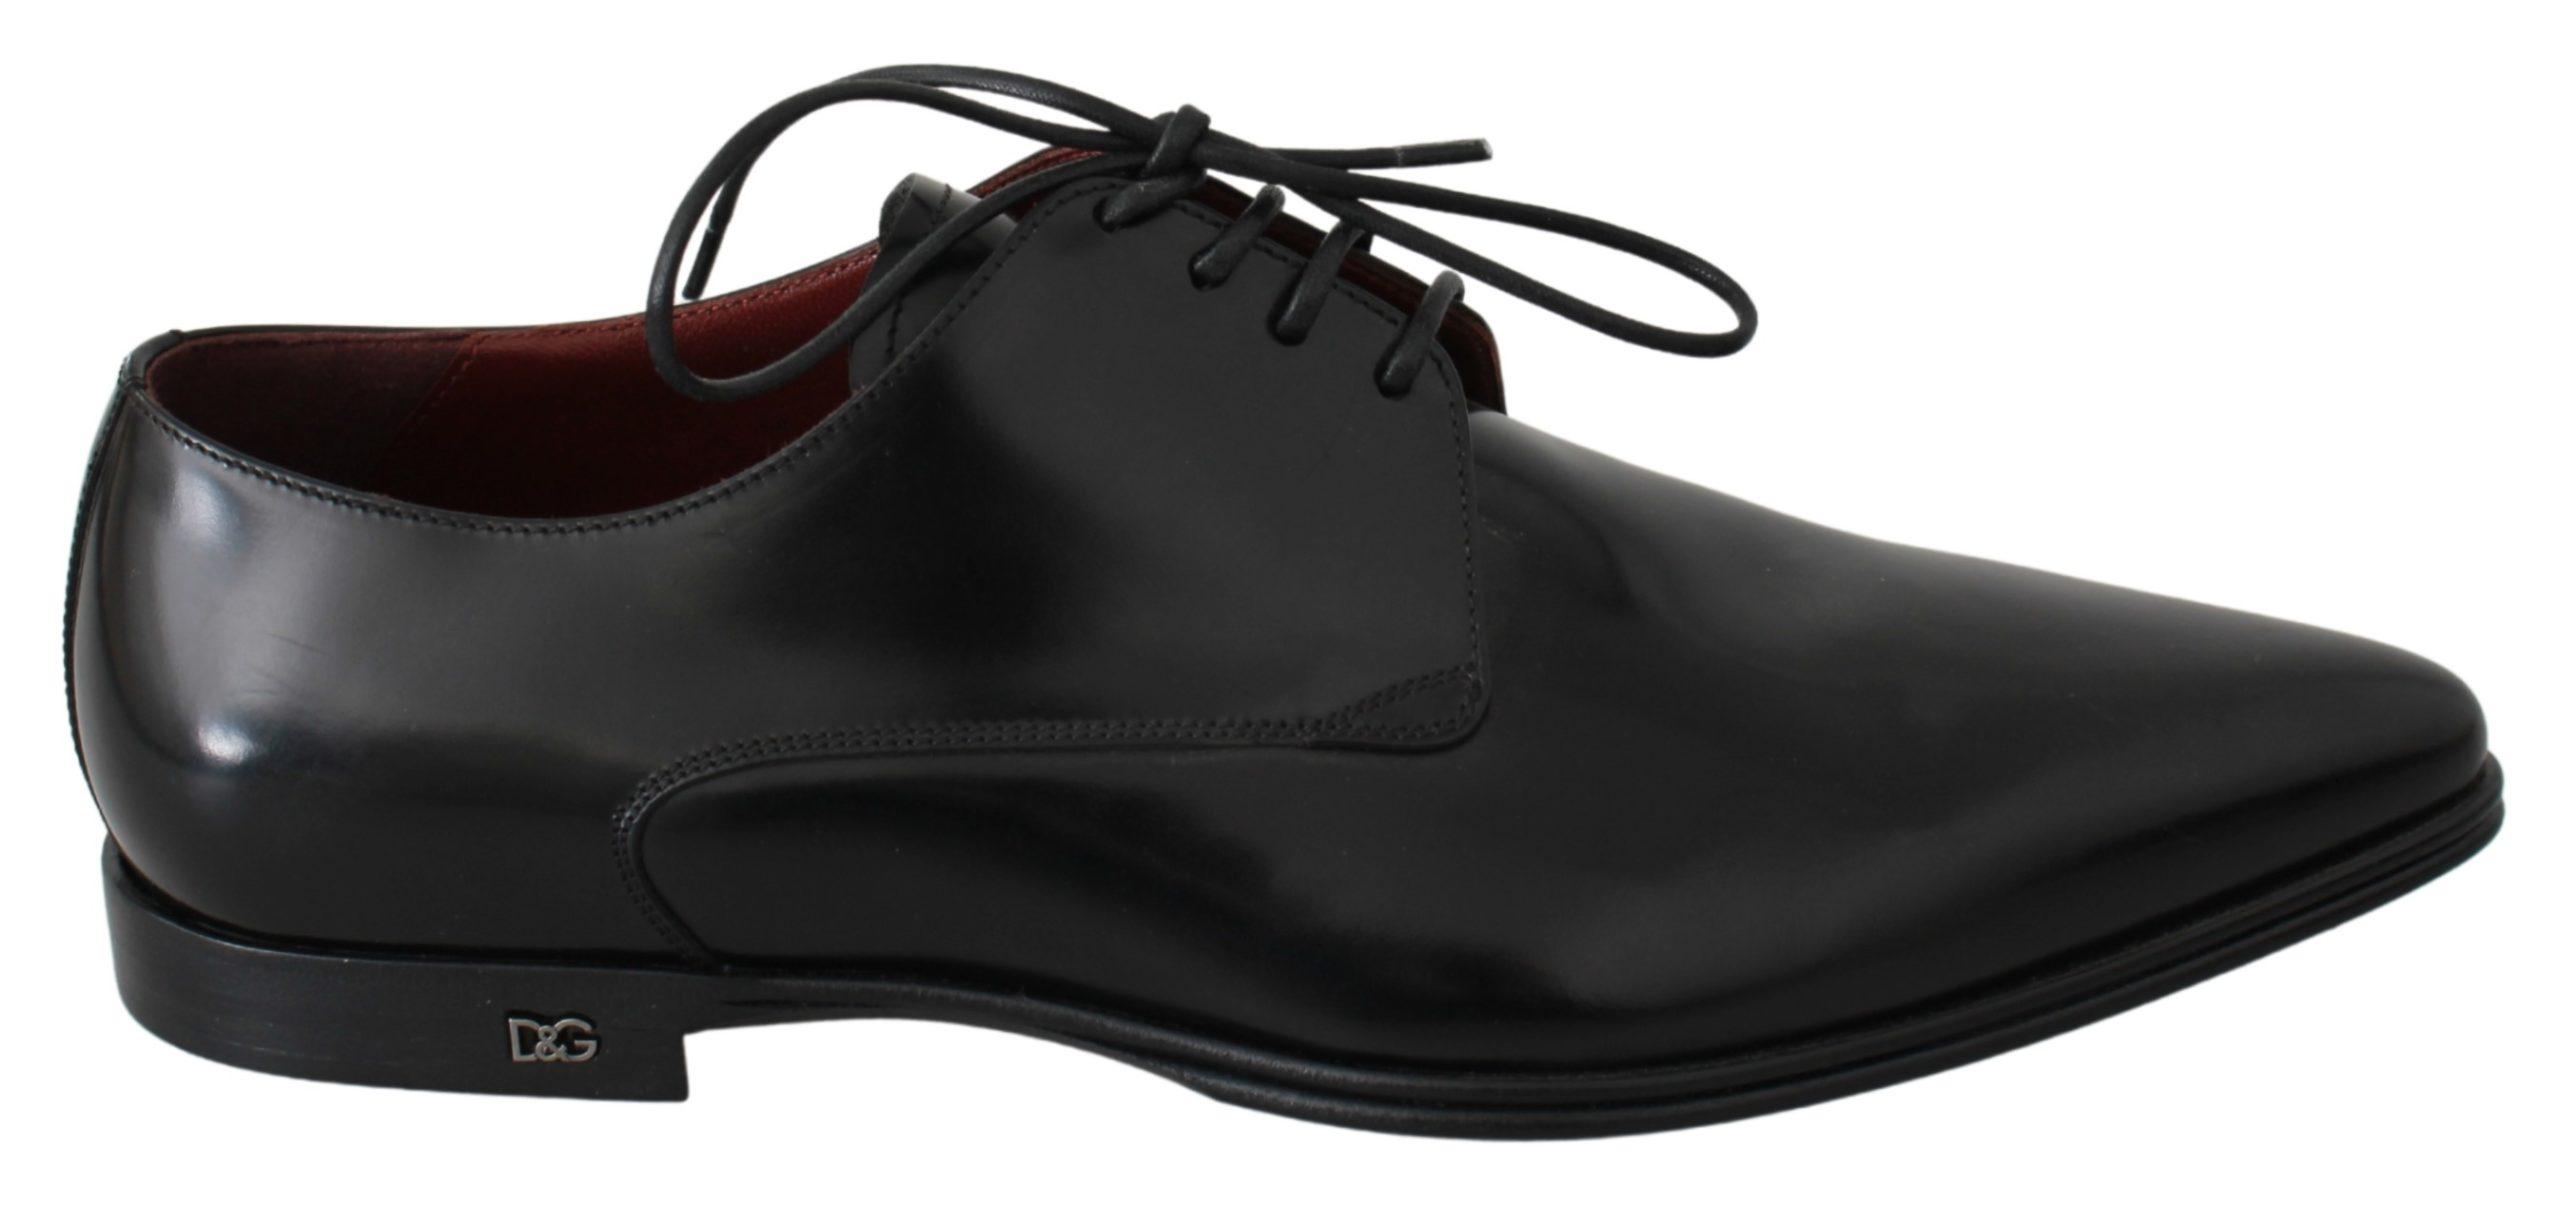 Dolce & Gabbana Men's Leather Derby Shoes Black MV2712 - EU39.5/US6.5